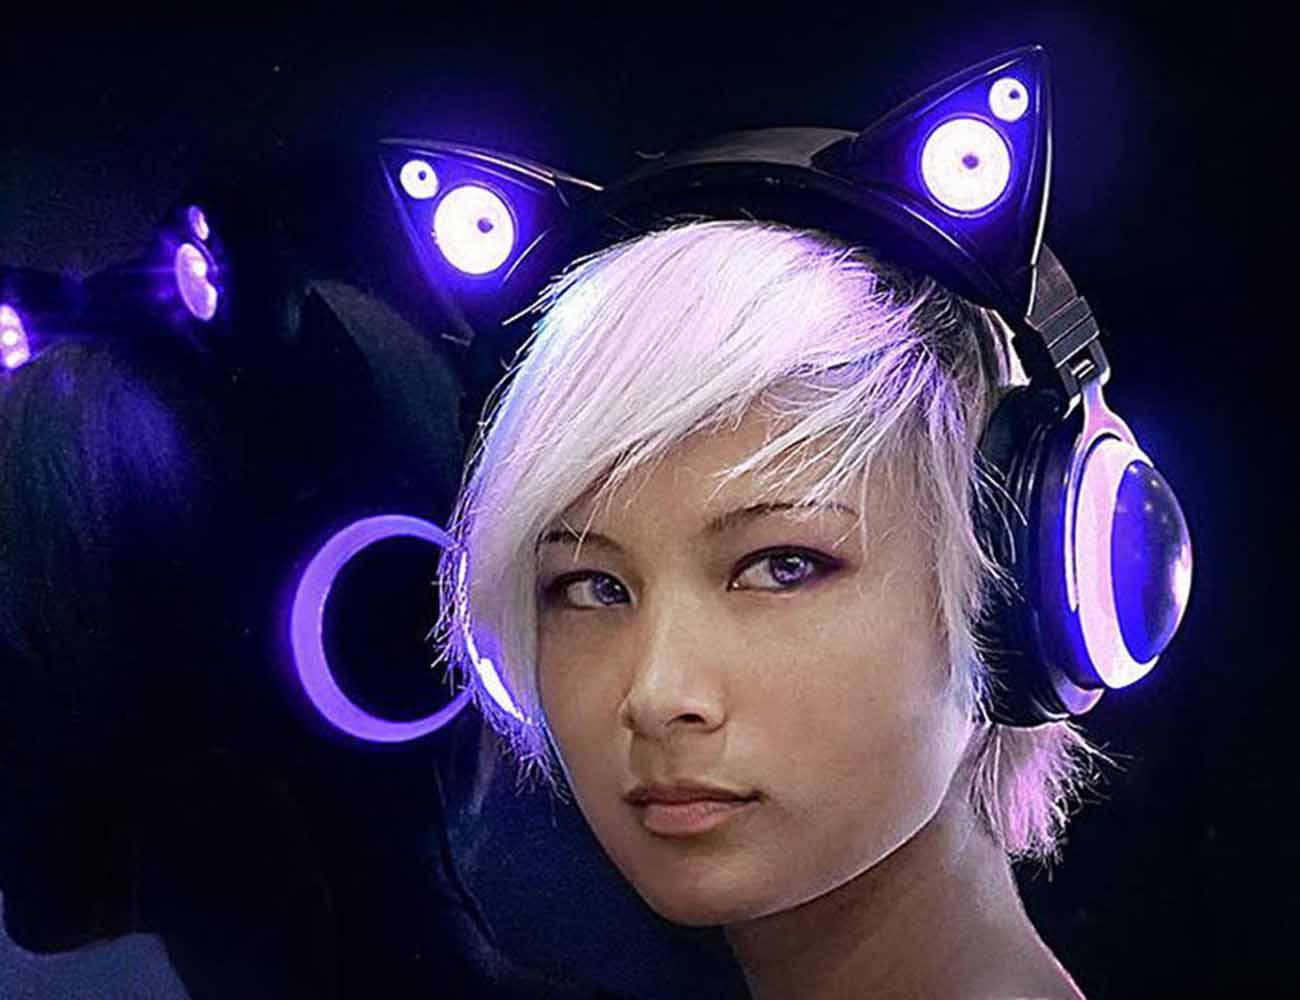 Axent Wear Cat Ear Headphones » Gadget Flow